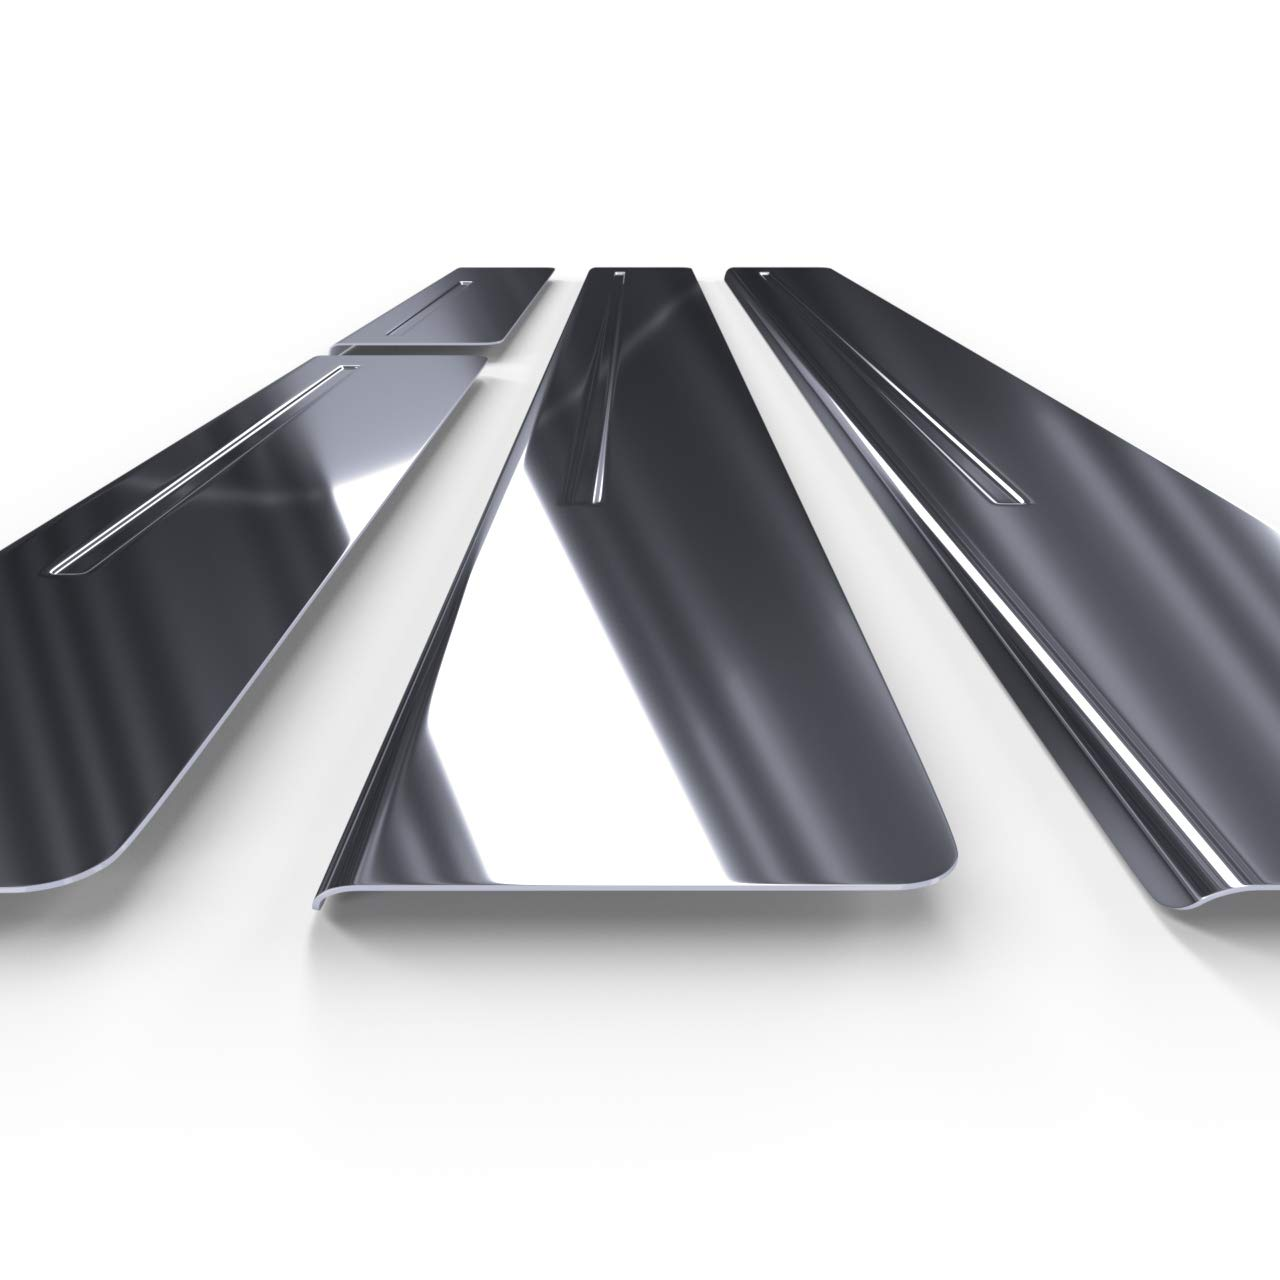 Kit battitacco auto in accciaio 5902538677080 4 pz argento lucido